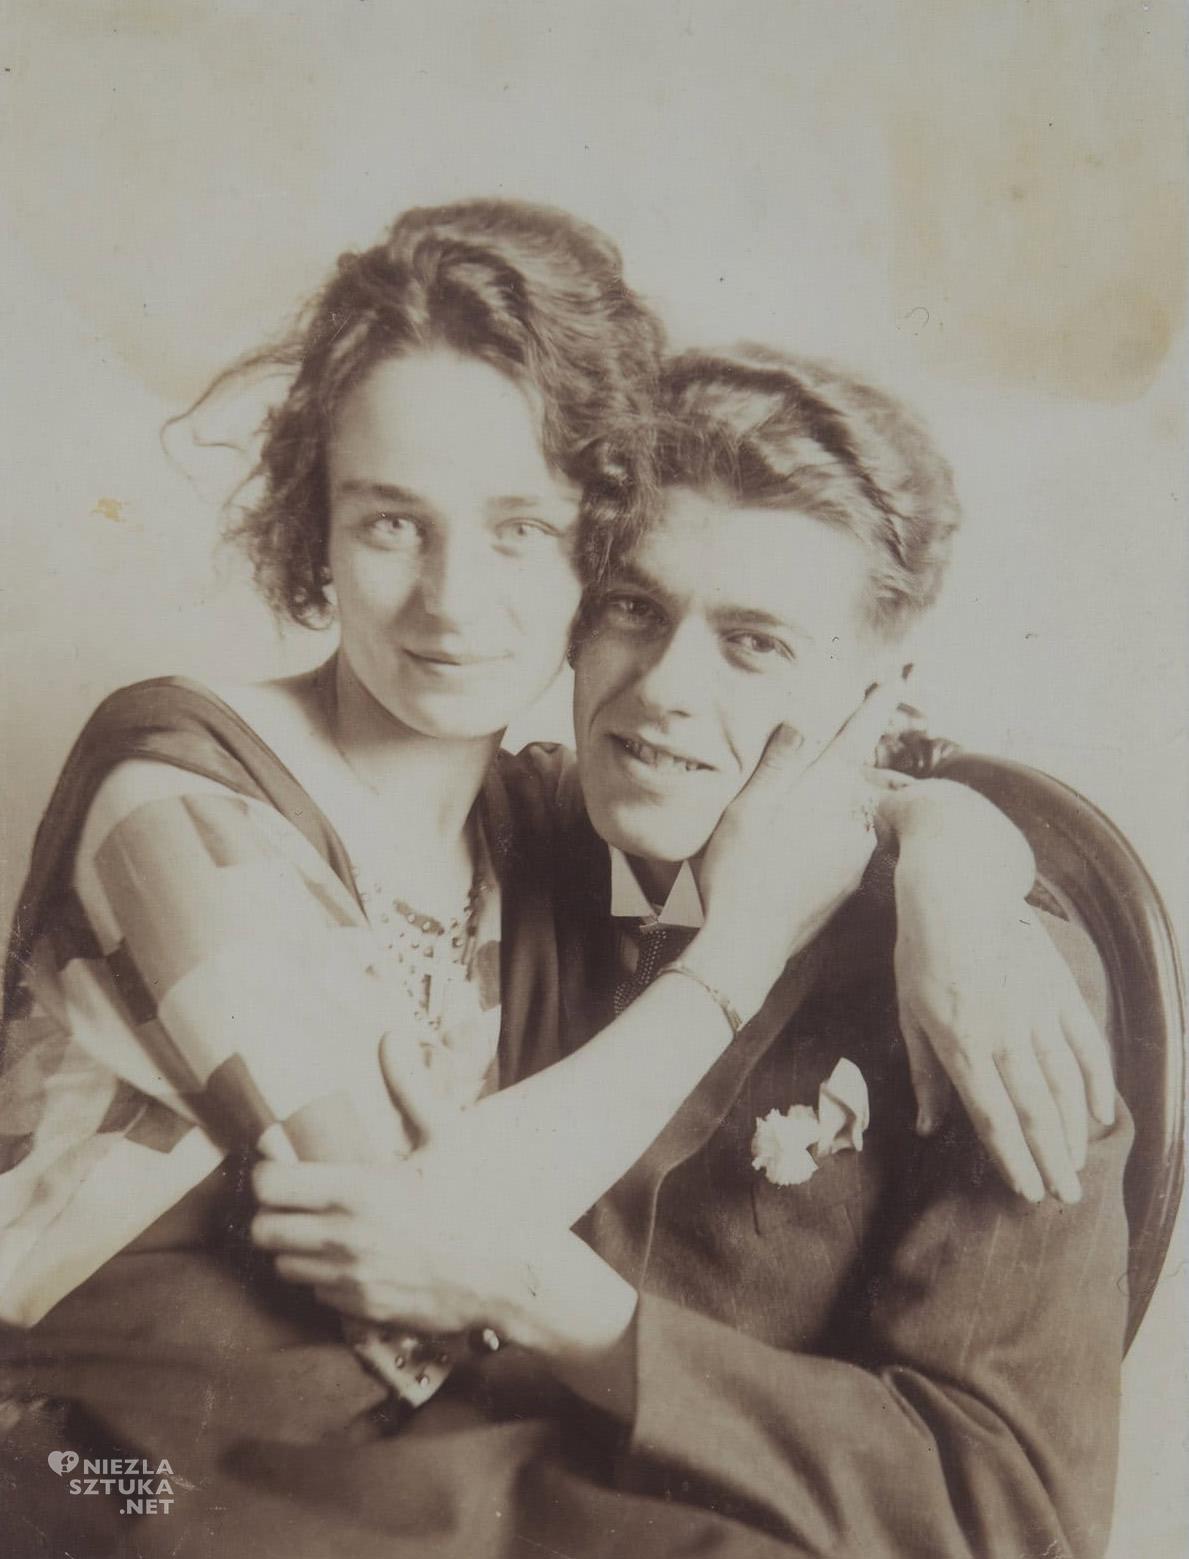 René Magritte, Georgette Berger, zdjęcie ślubne, Niezła sztuka